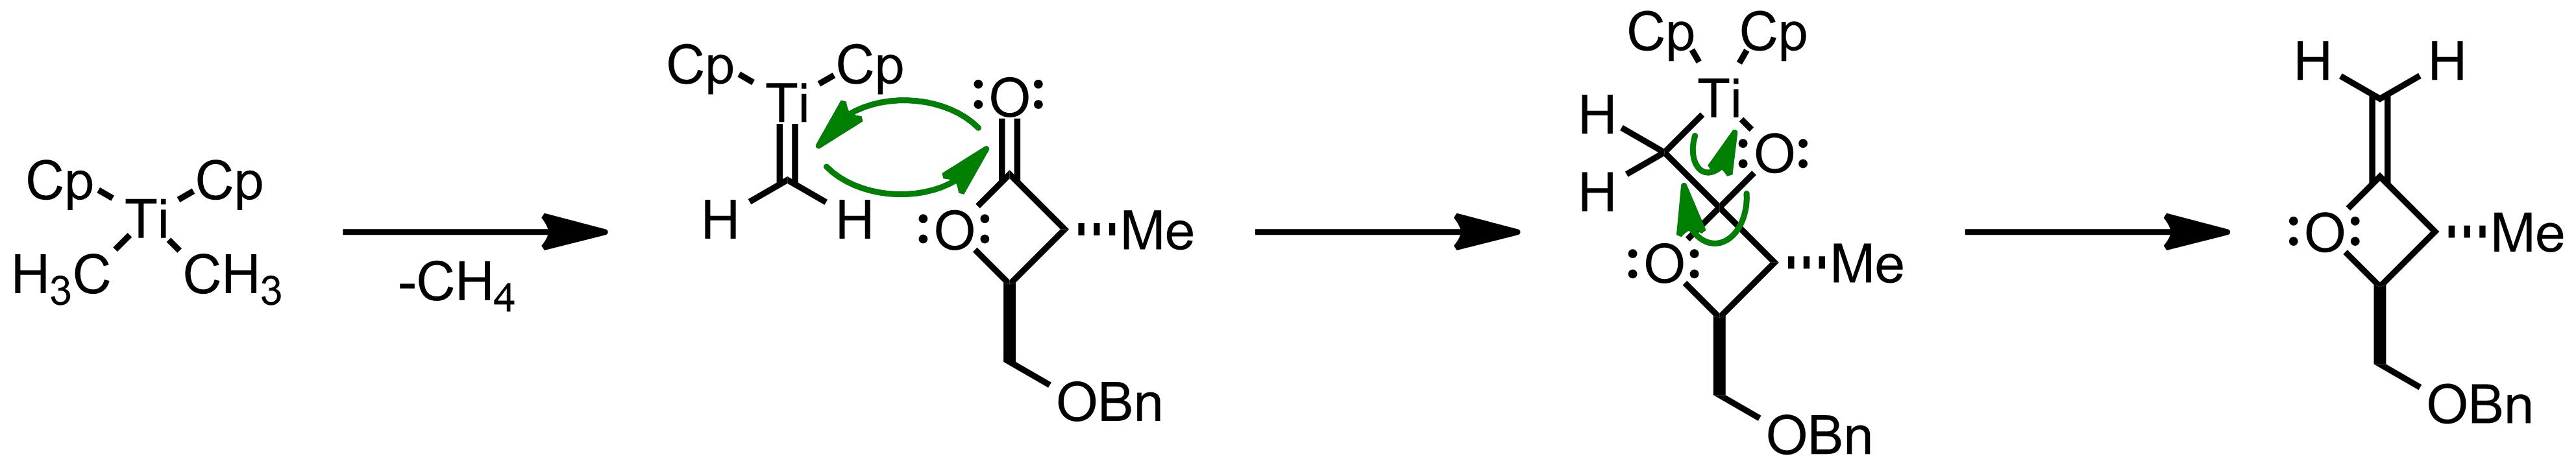 Mechanism of the Tebbe-Petasis Olefination